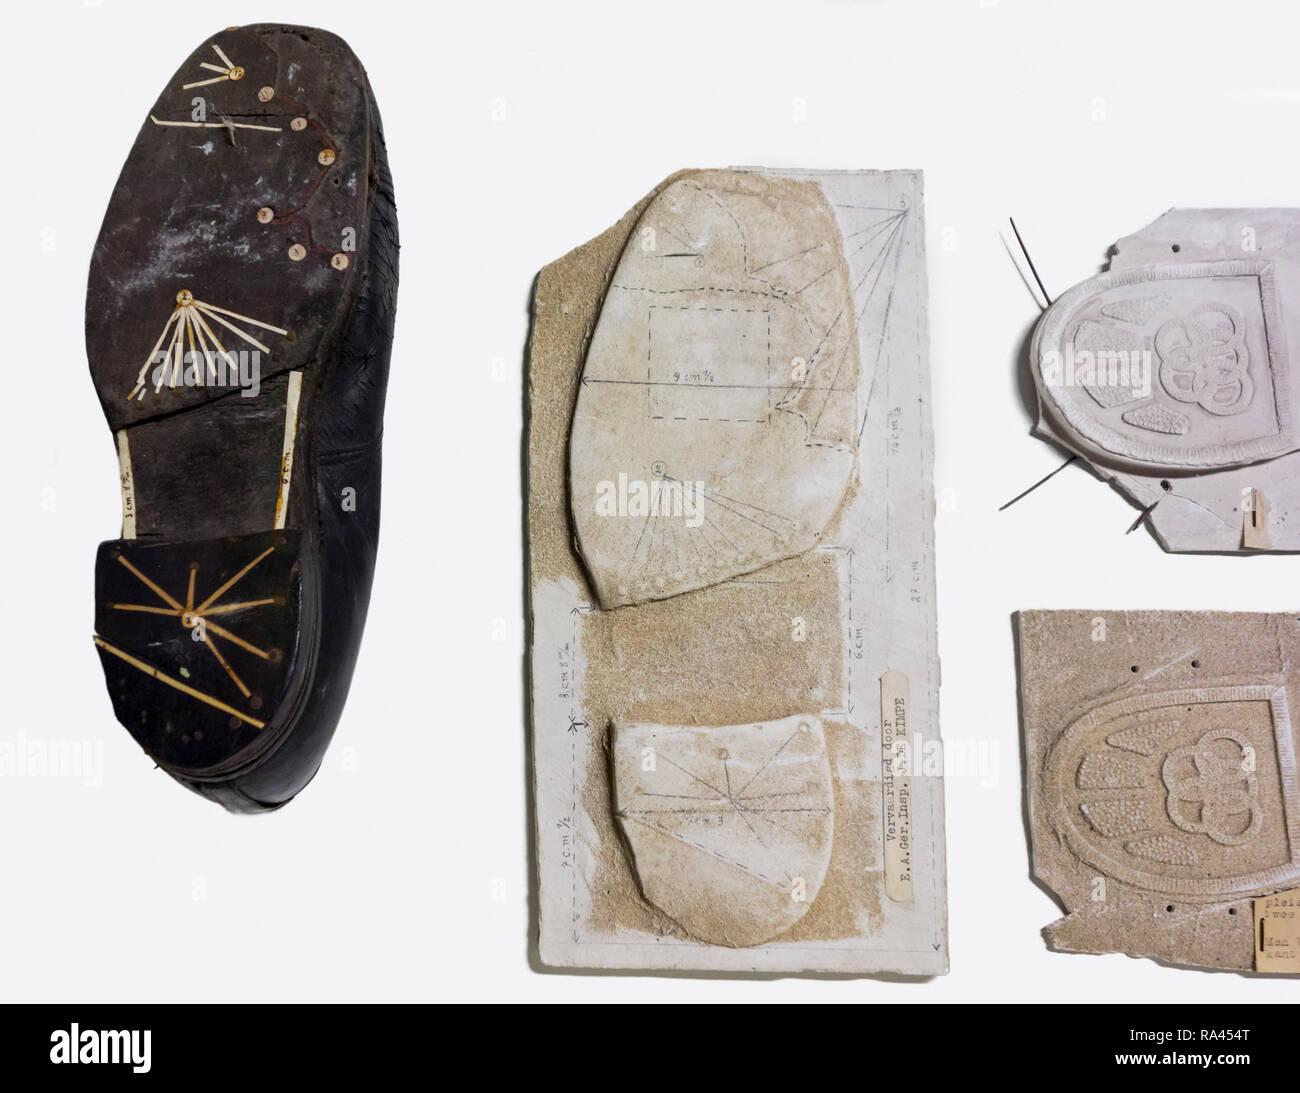 Plaster cast of shoe sole tread from criminal's shoes taken at crime scene for criminal investigation - Stock Image